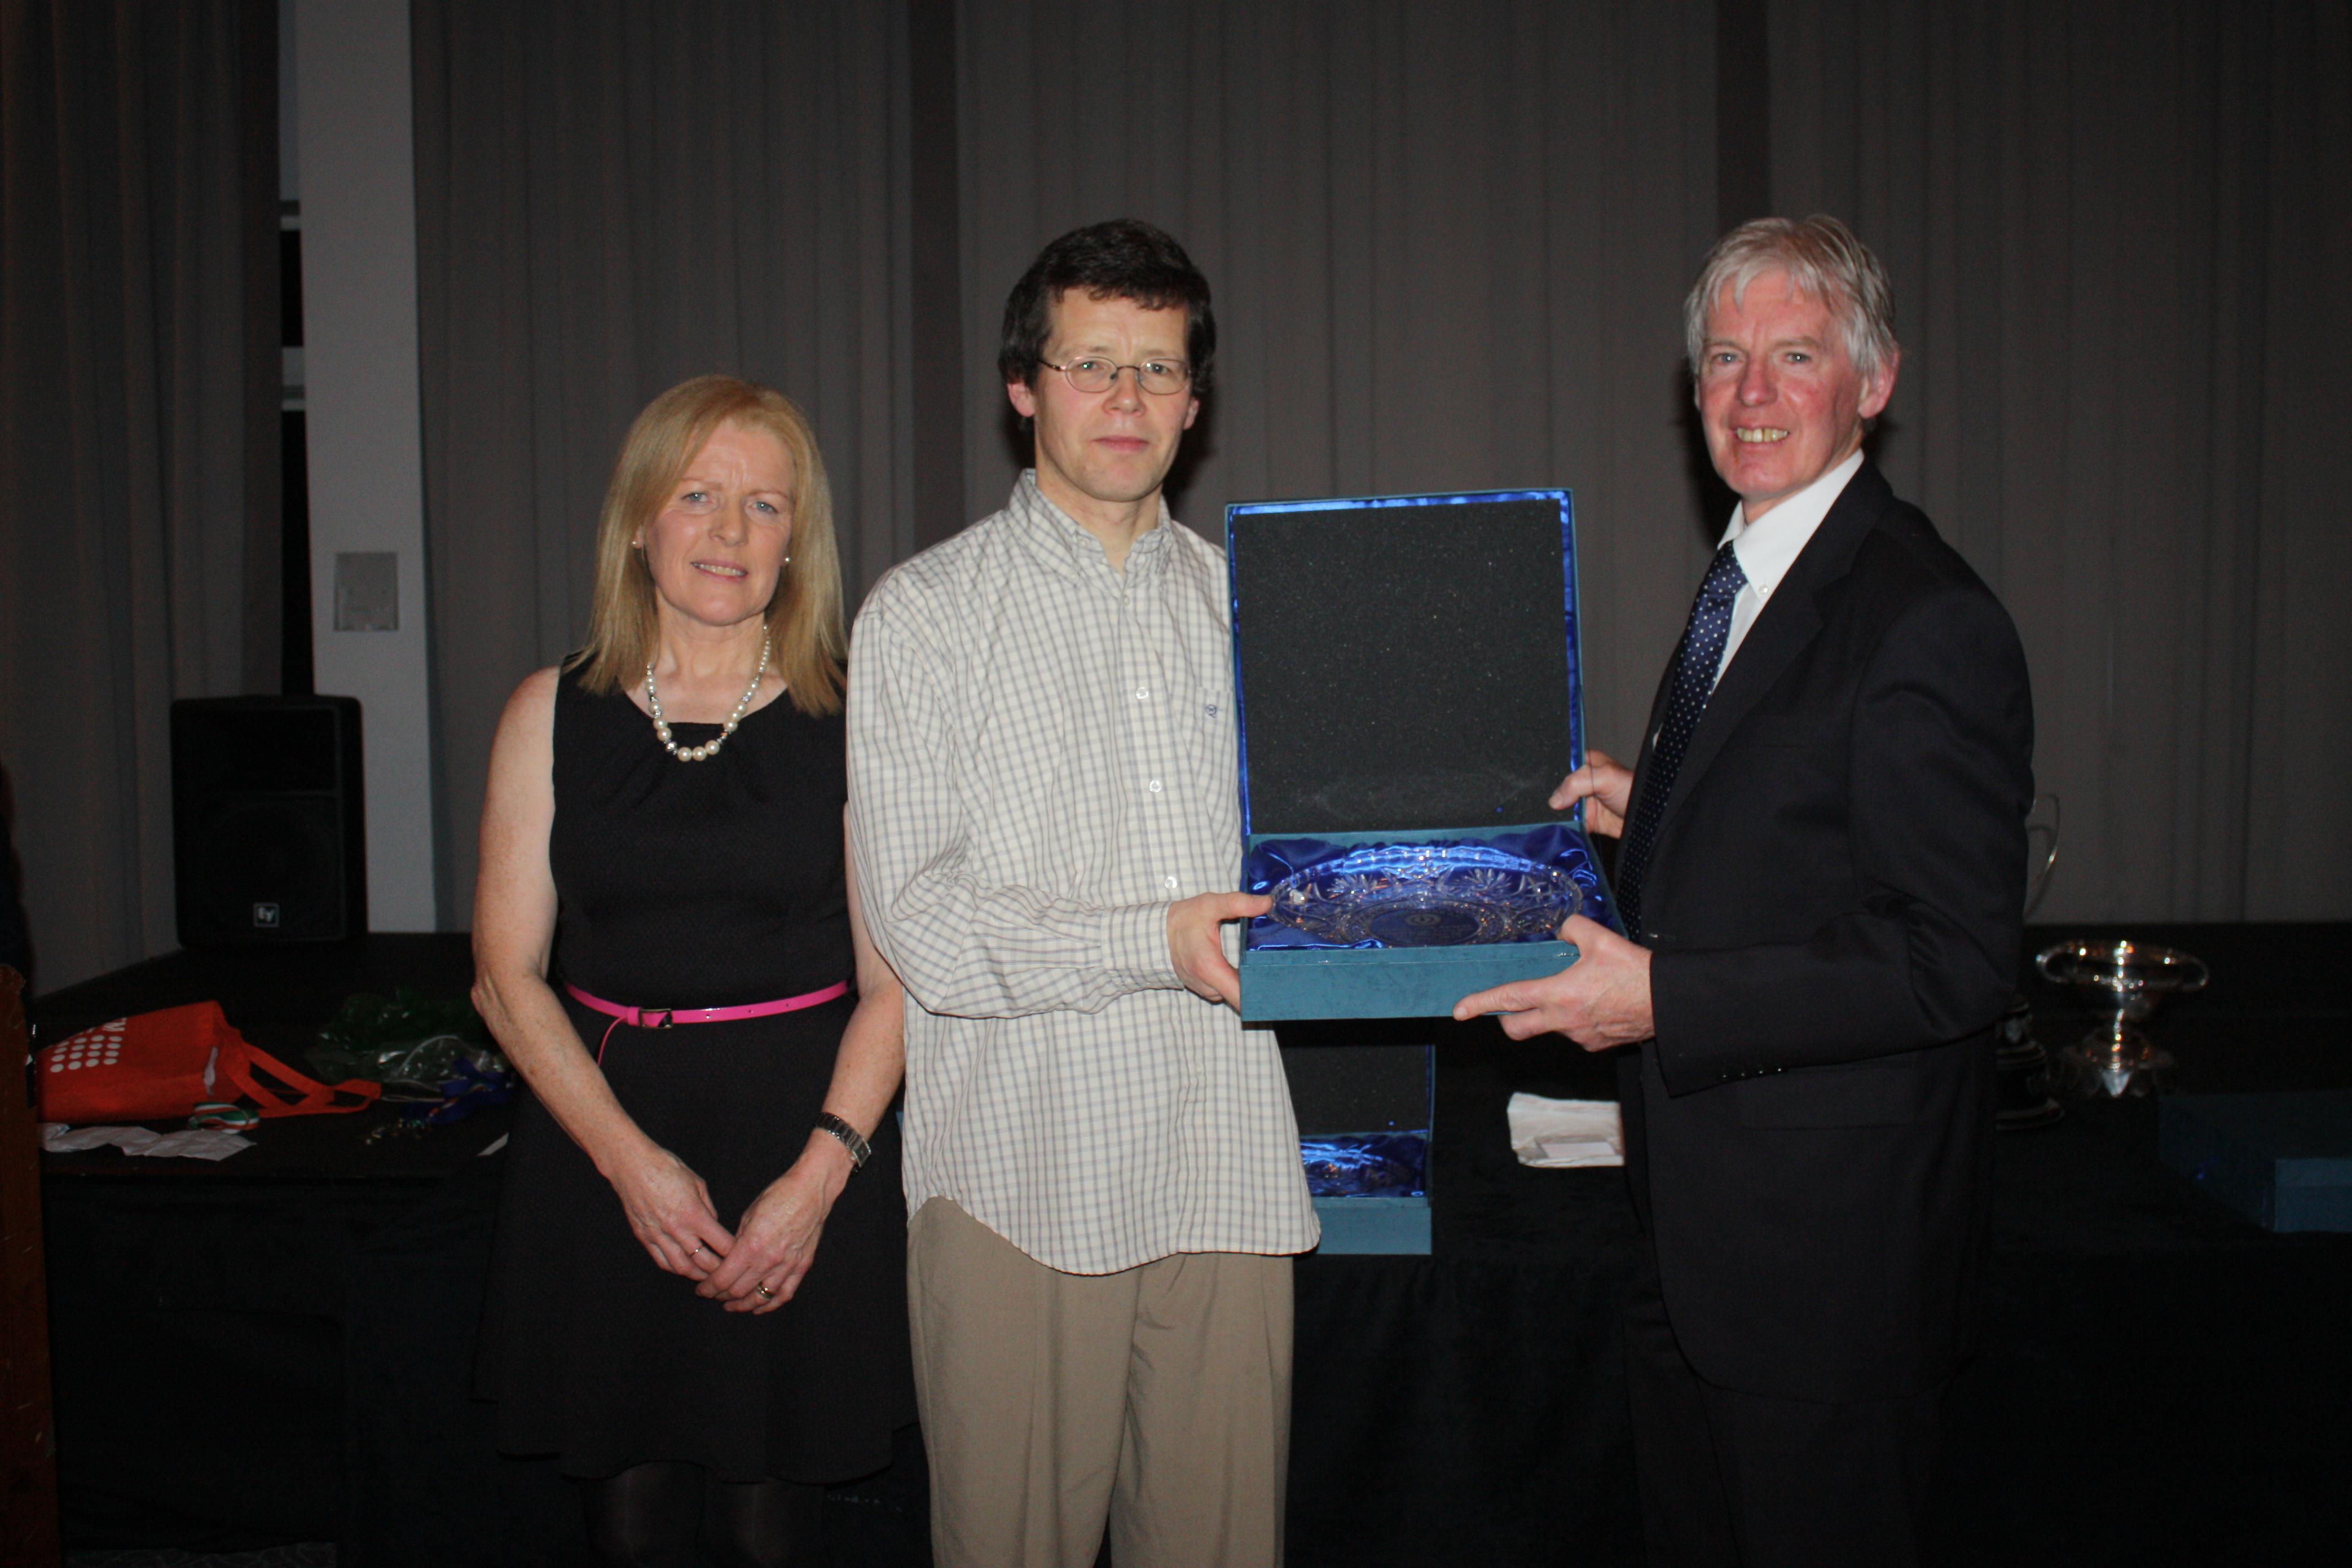 st-finbarrs-awards-night-2012-029